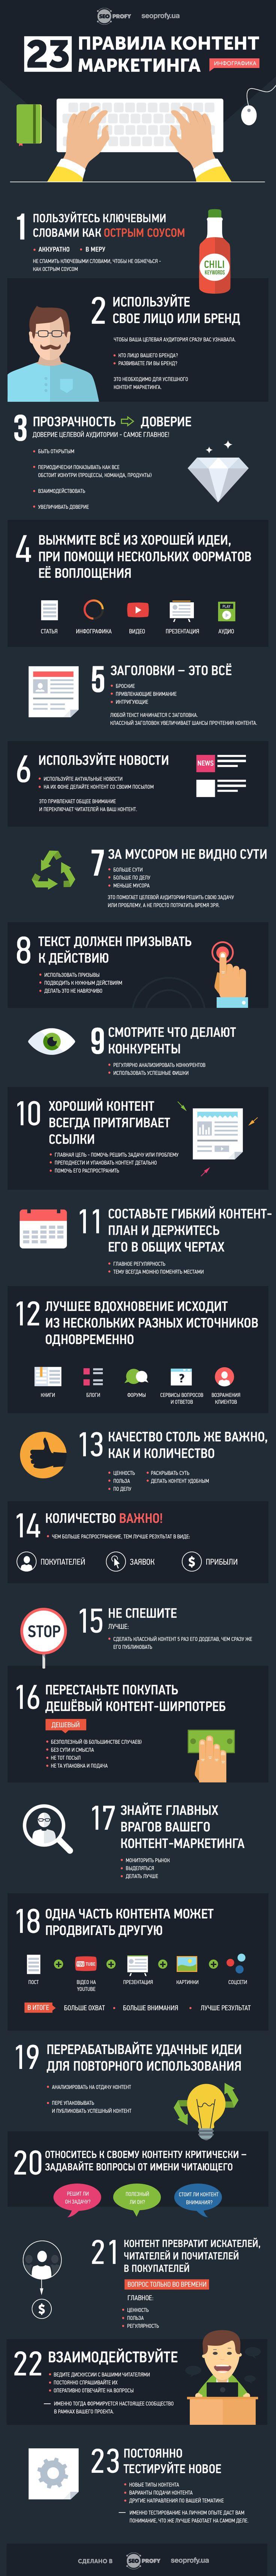 Как работает контент маркетинг. 23 правила контент маркетинга. http://www.kushnir.com.ua/kak-rabotaet-kontent-marketing/